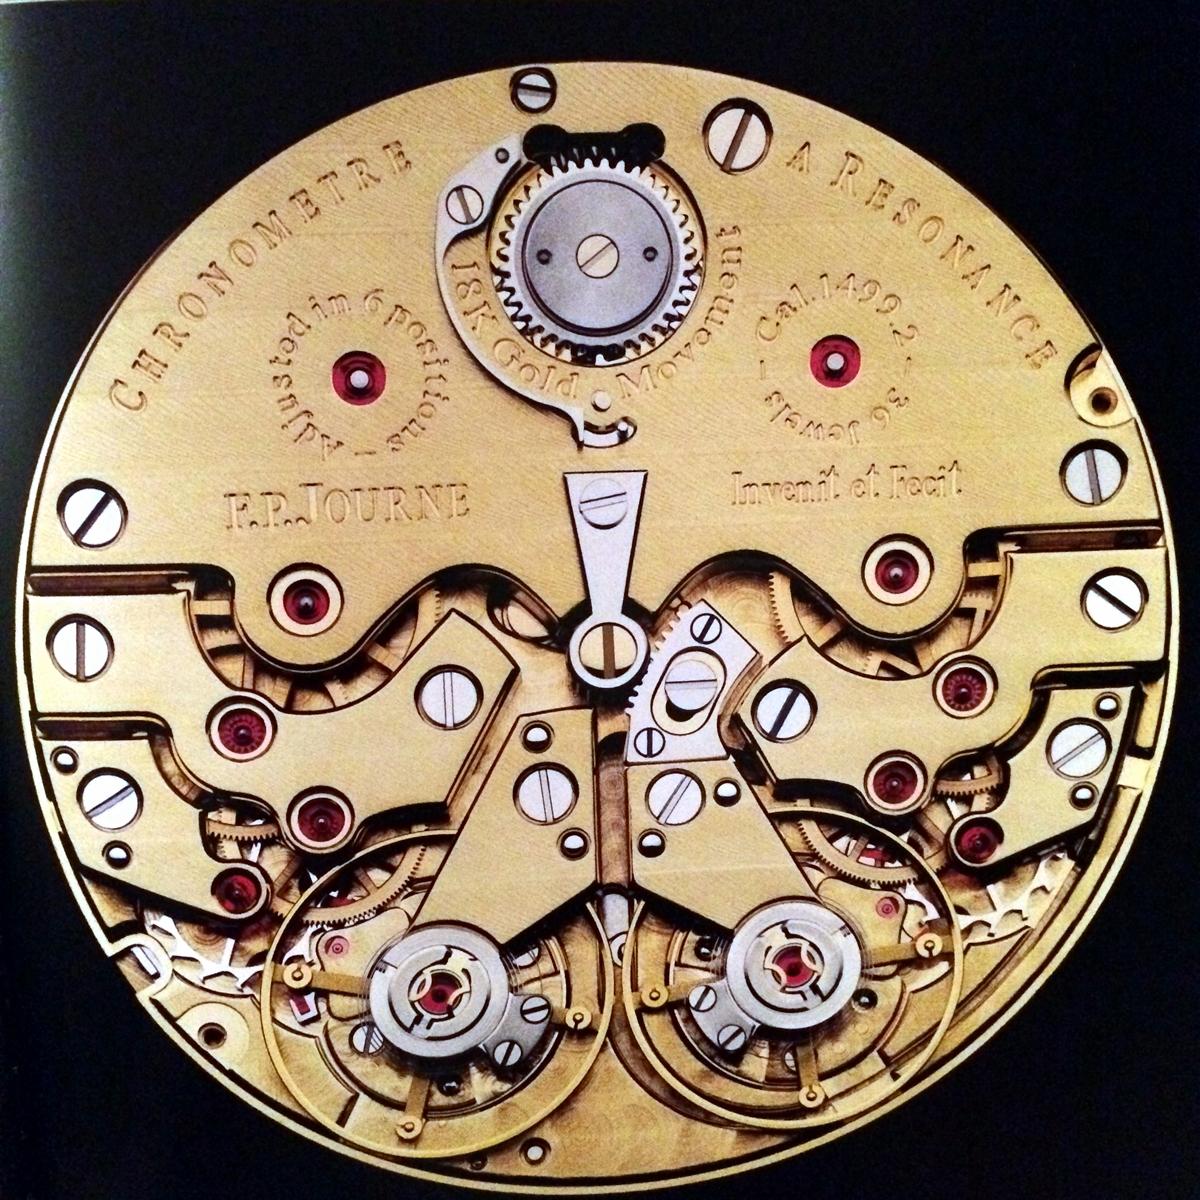 13 design z zegarkiem w ręku luksusowe zegarki SIHH Geneve lifestyle forelements blog